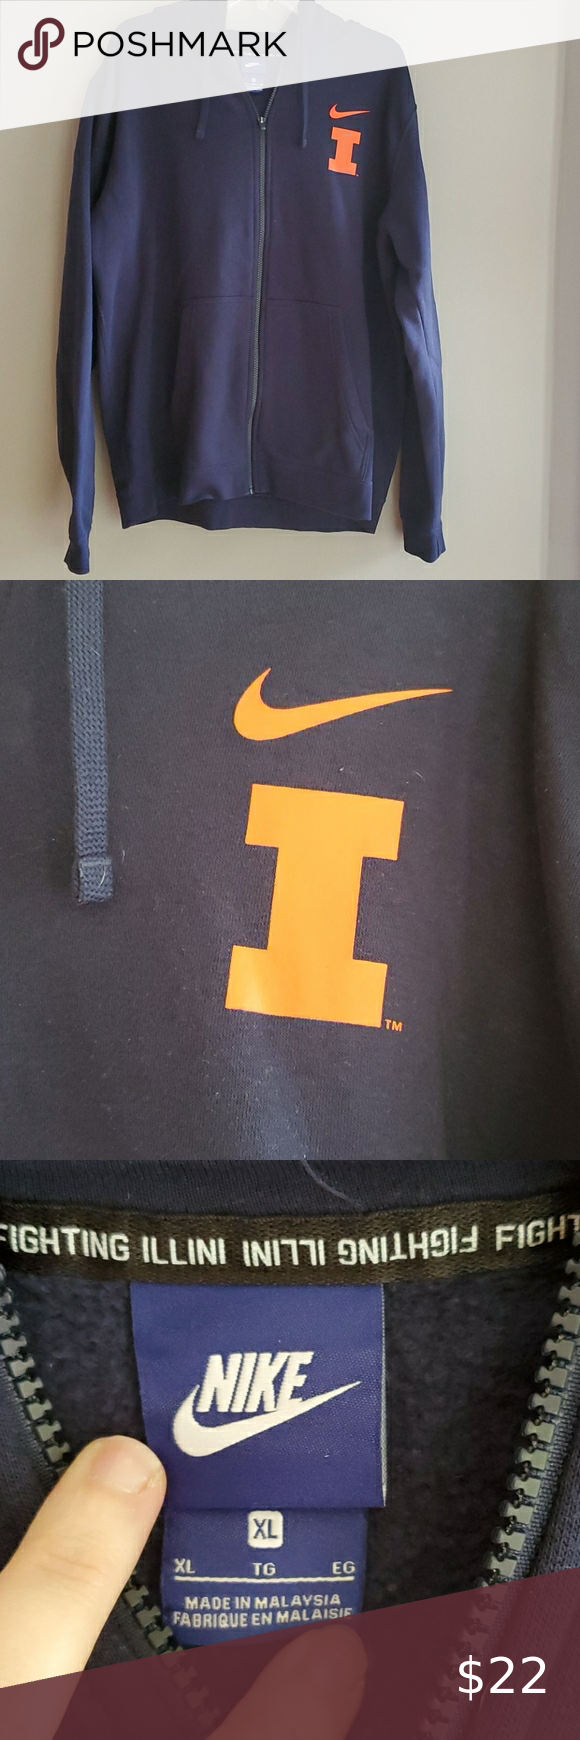 Nike Zip Up Hoodie Illinois Illini Xl Sweatshirt Sweatshirts Nike Zip Up Hoodies [ 1740 x 580 Pixel ]